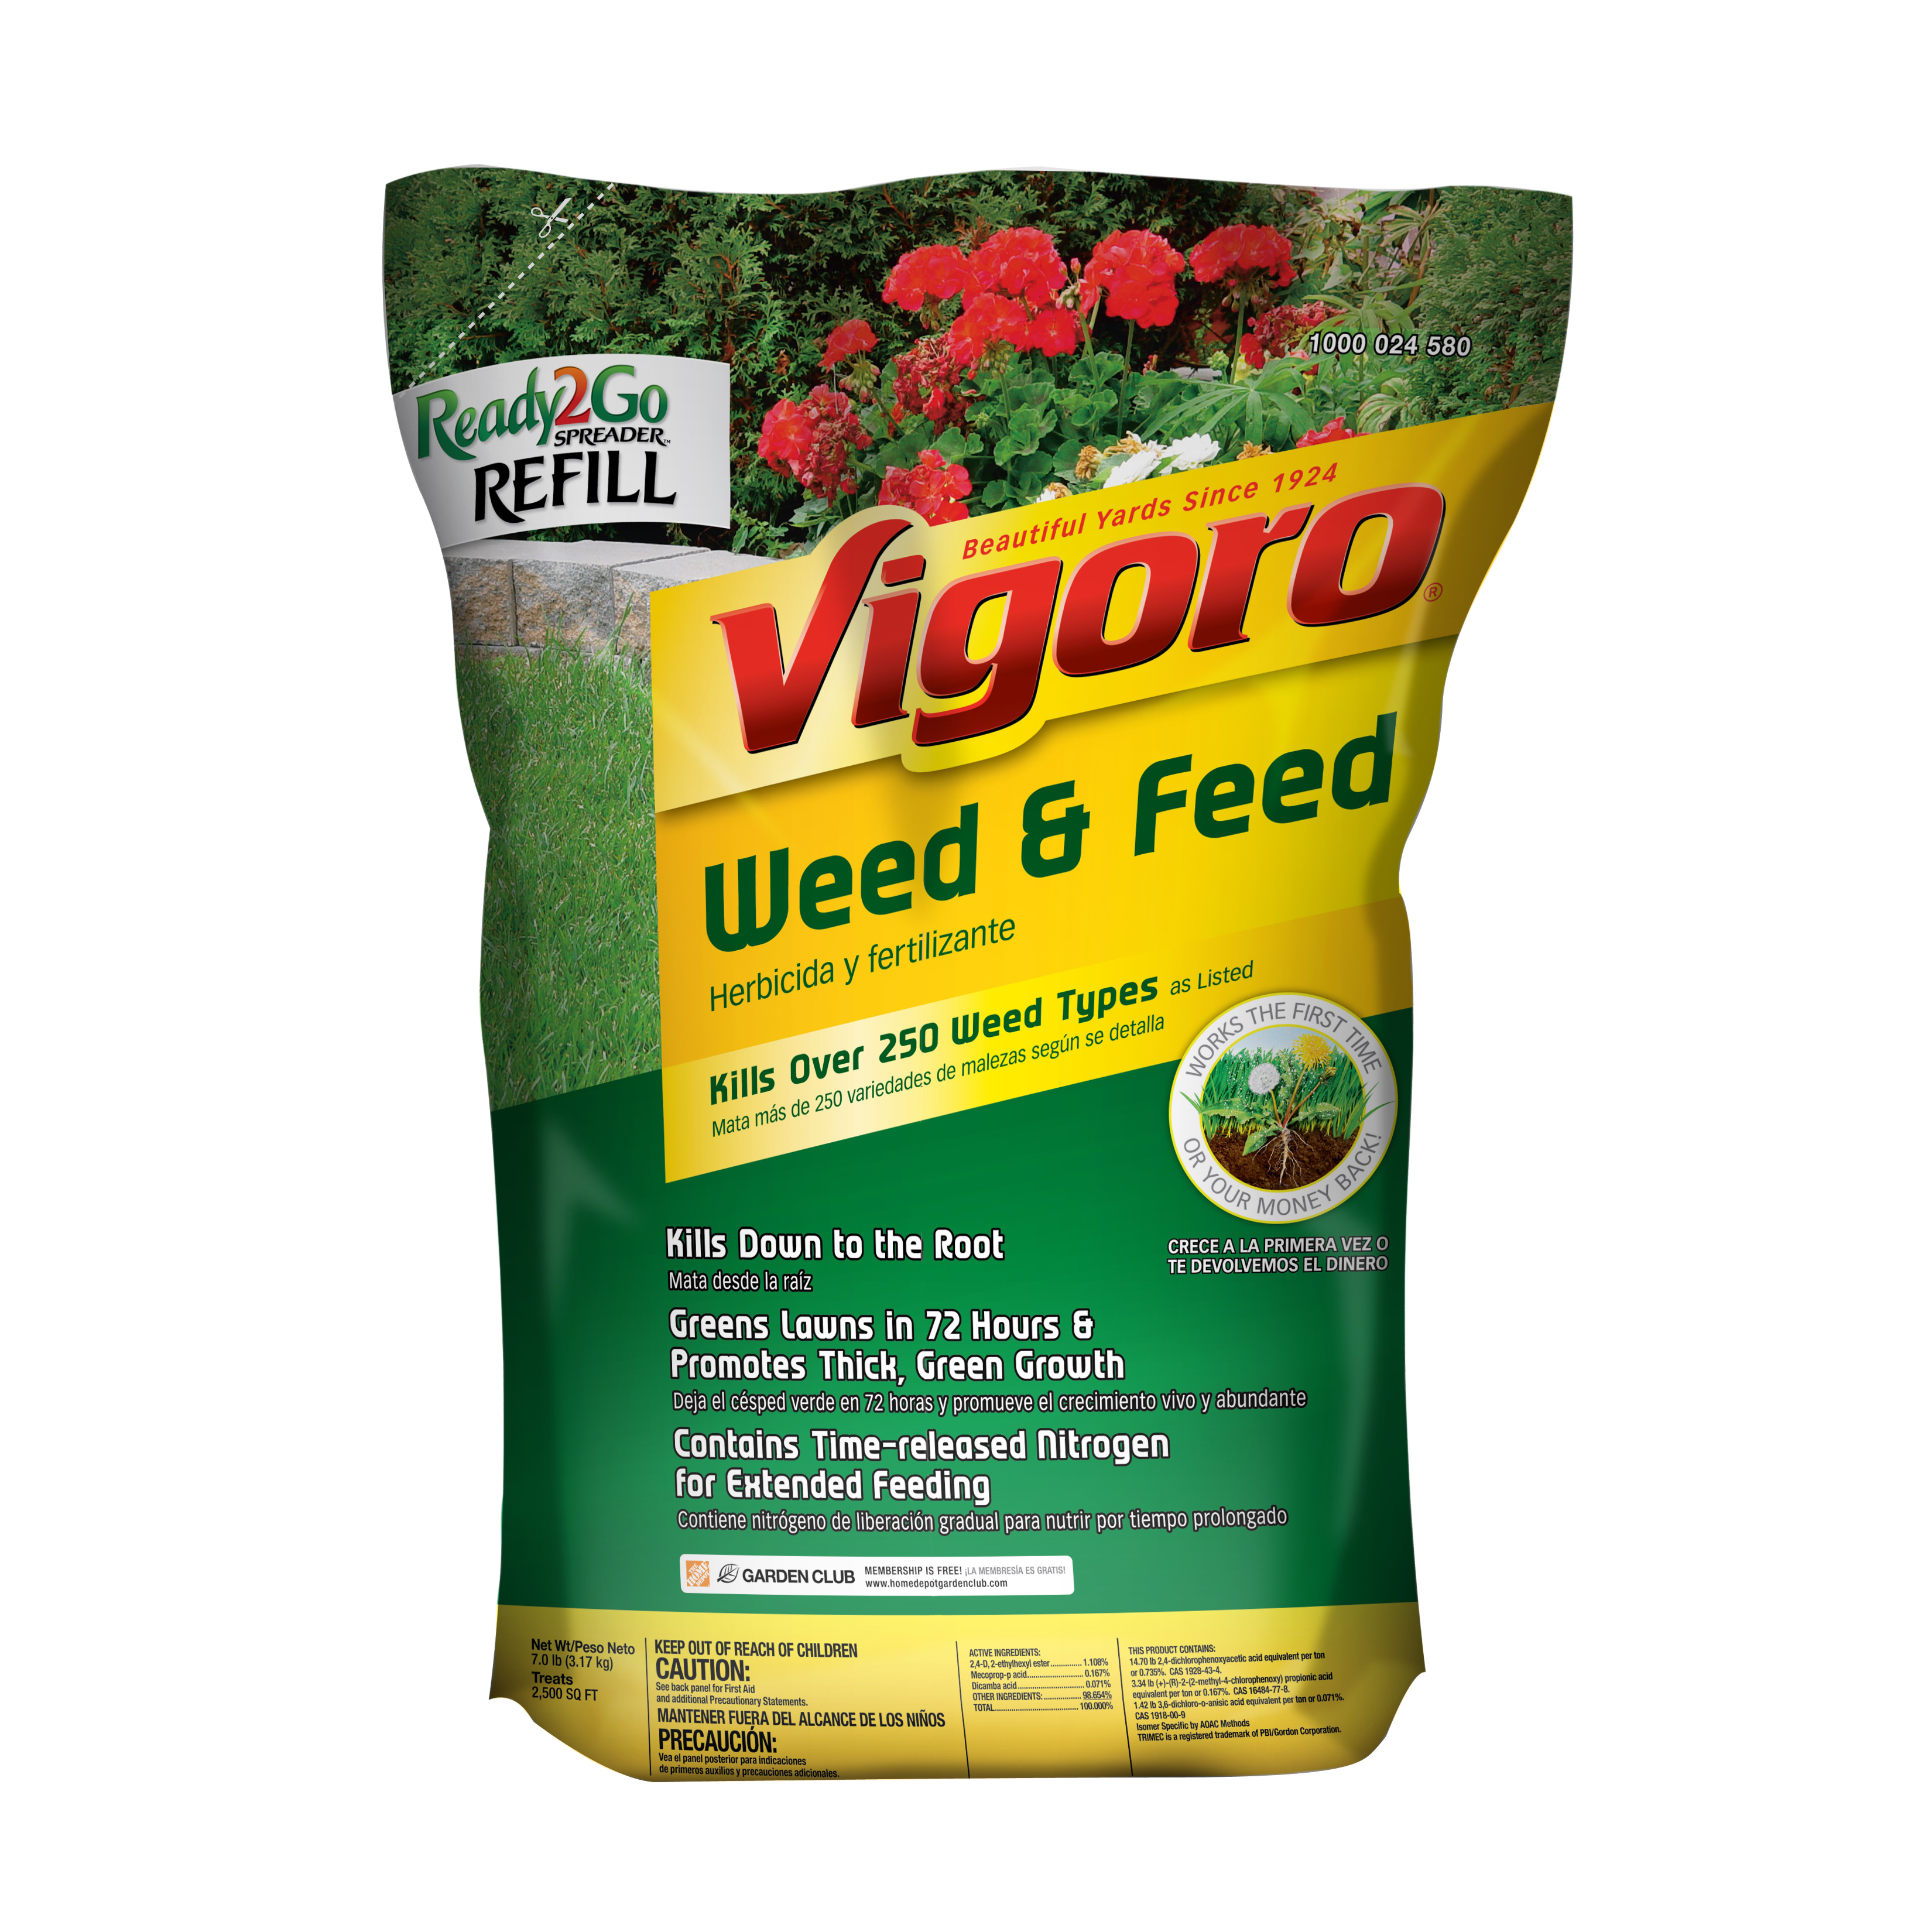 Vigoro Weed and Feed Ready-2-Go Weed Killer - Walmart.com